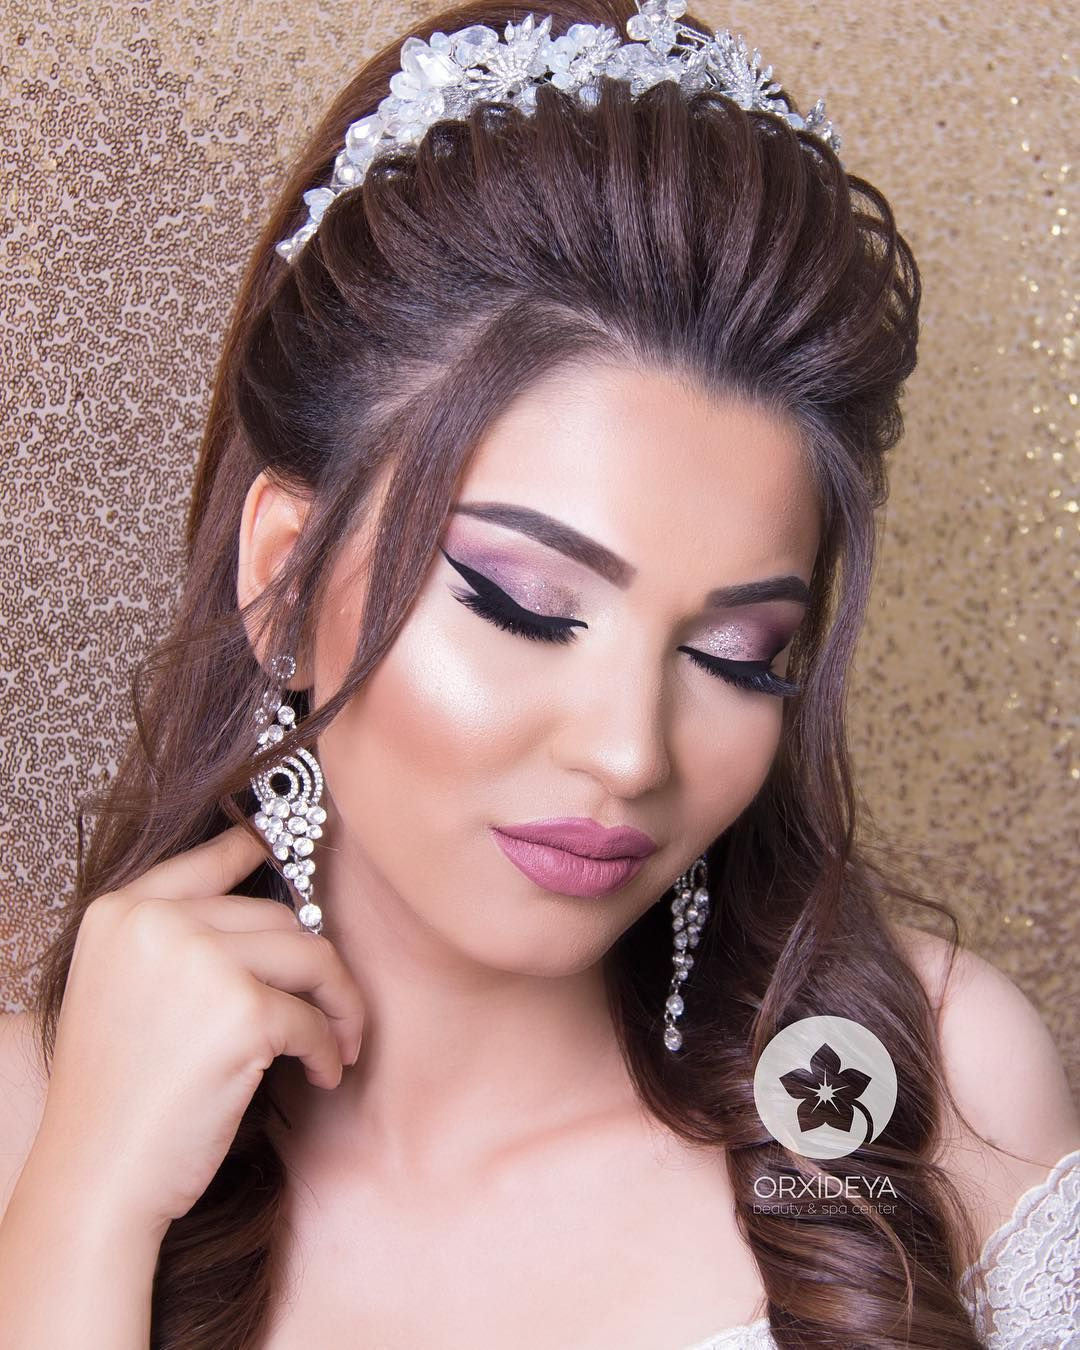 Aksaminiz Xeyir Olsun Sac Makiyaja By Me Feride Orxideya Orxideya Gozellikmerkezi Indian Bridal Hairstyles Hair Beauty Bridal Hair